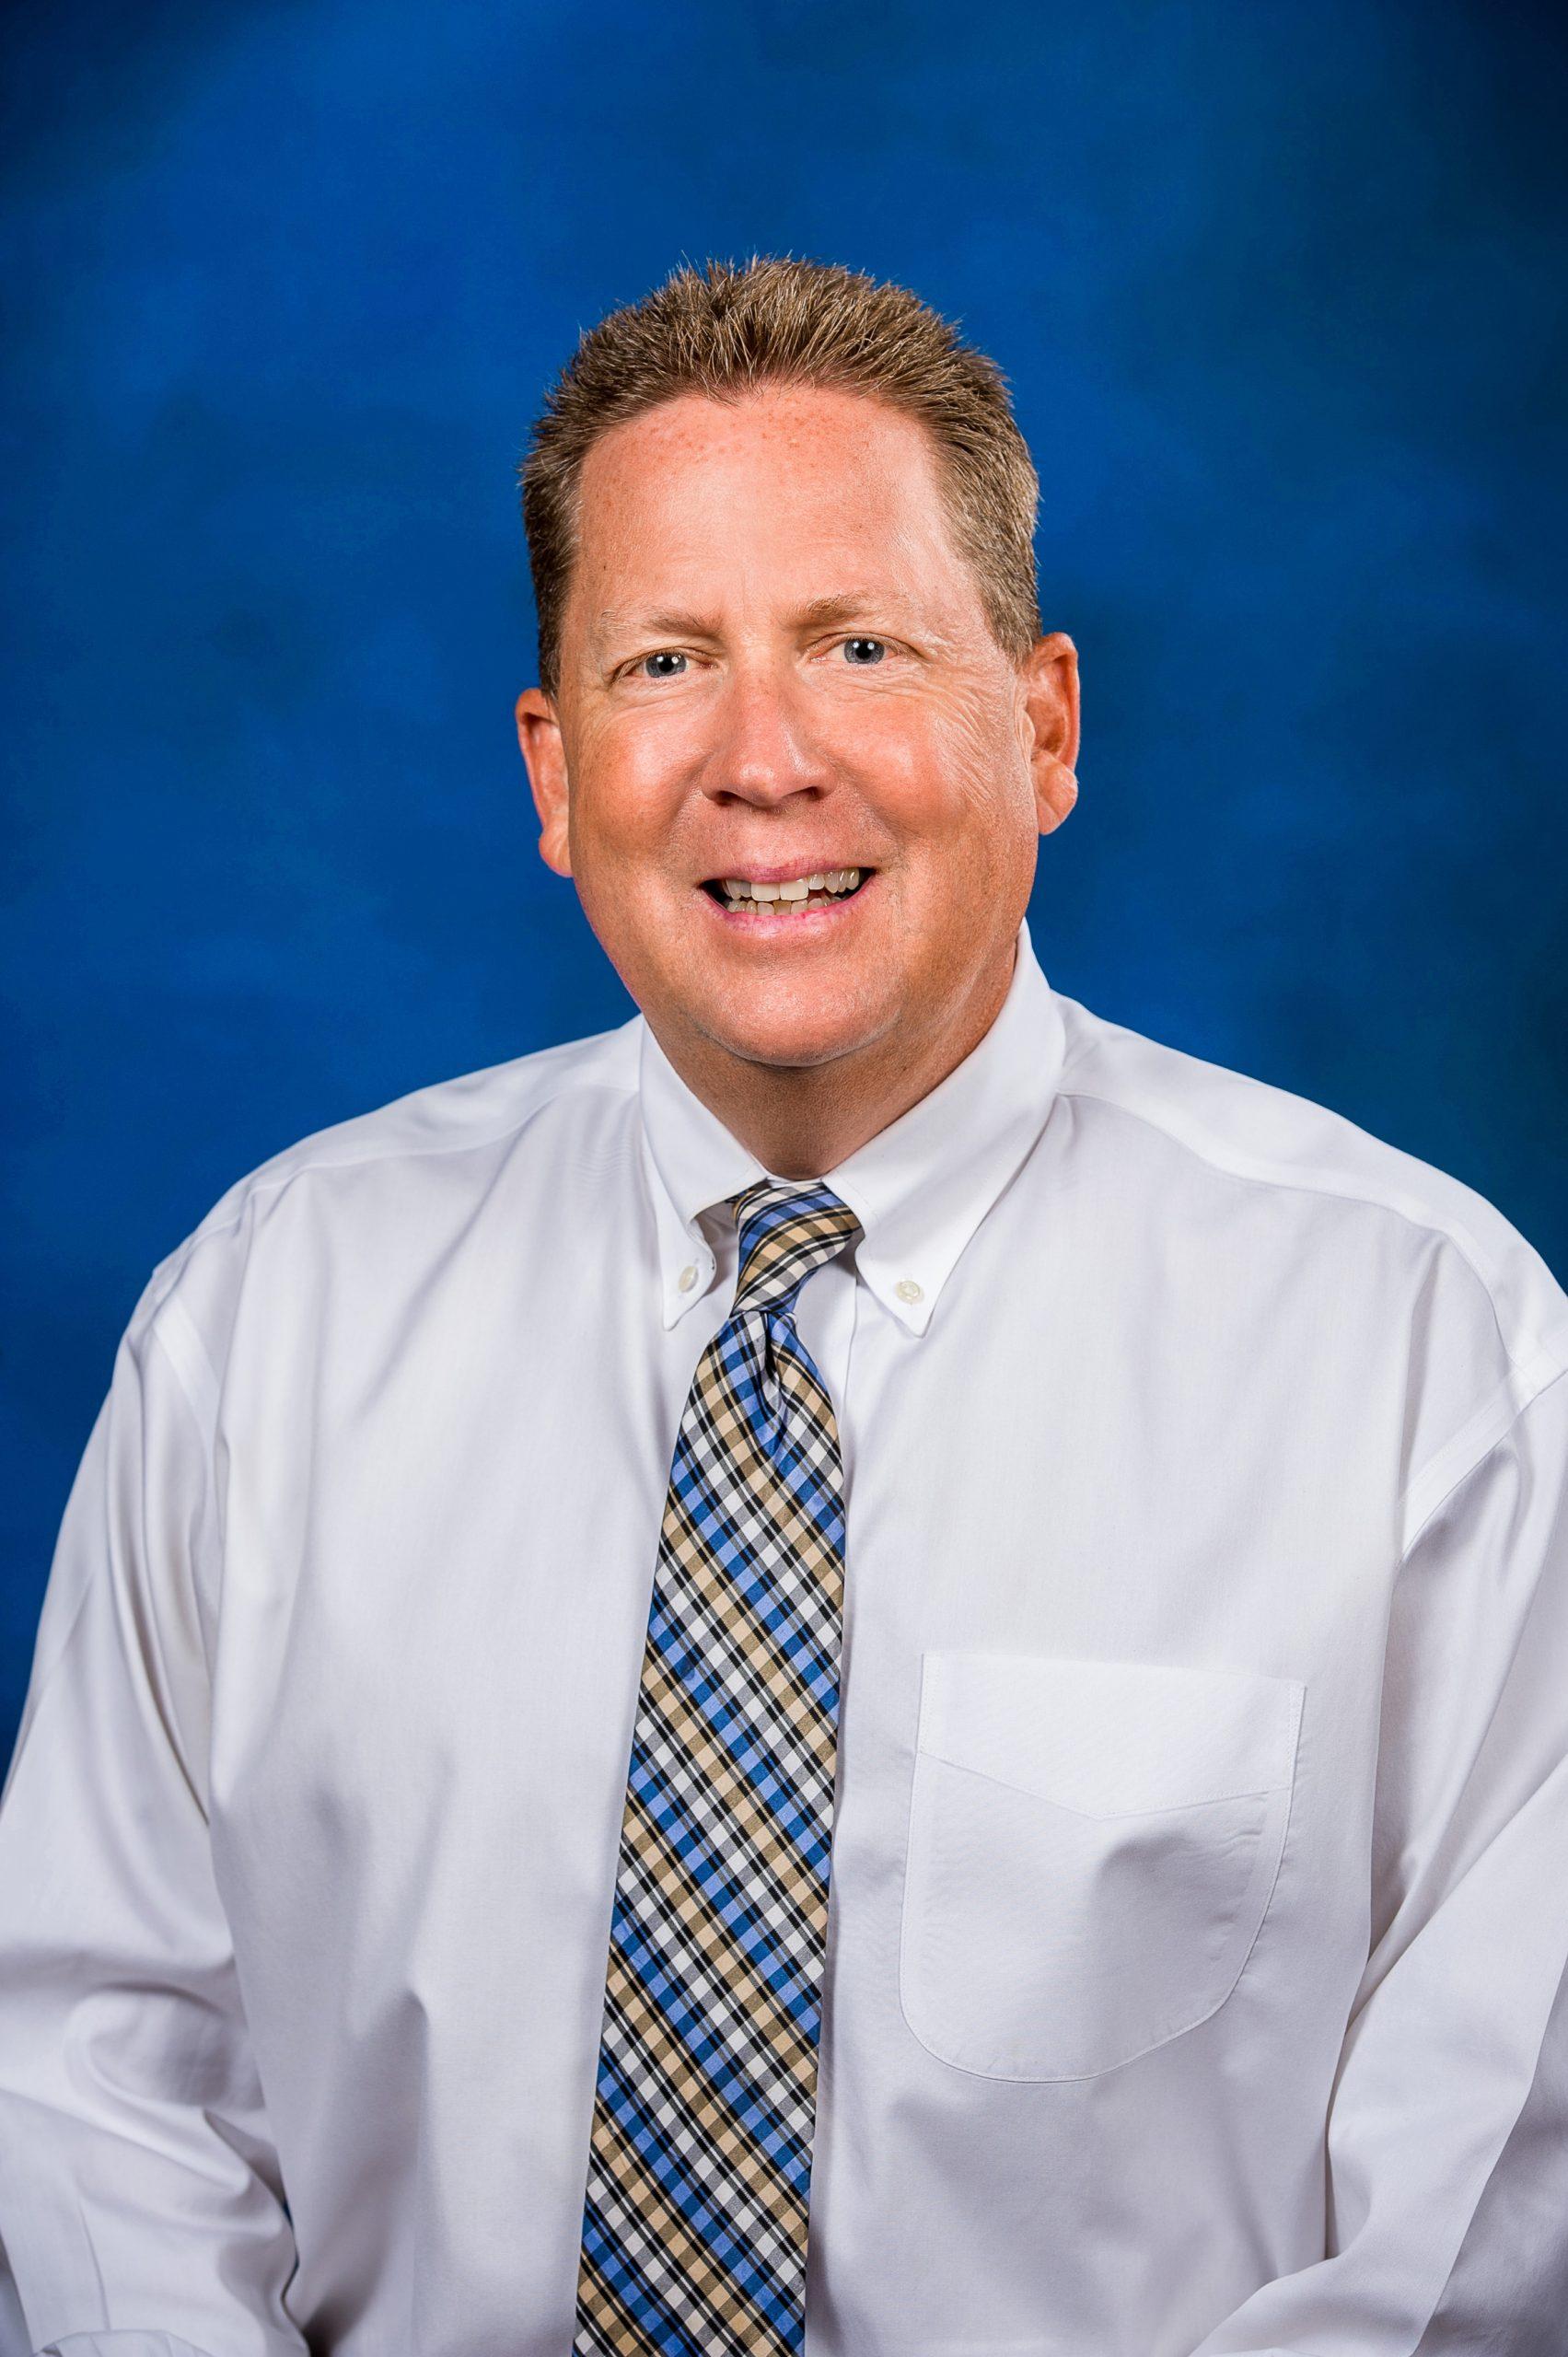 Portrait of Dr. Stanfield